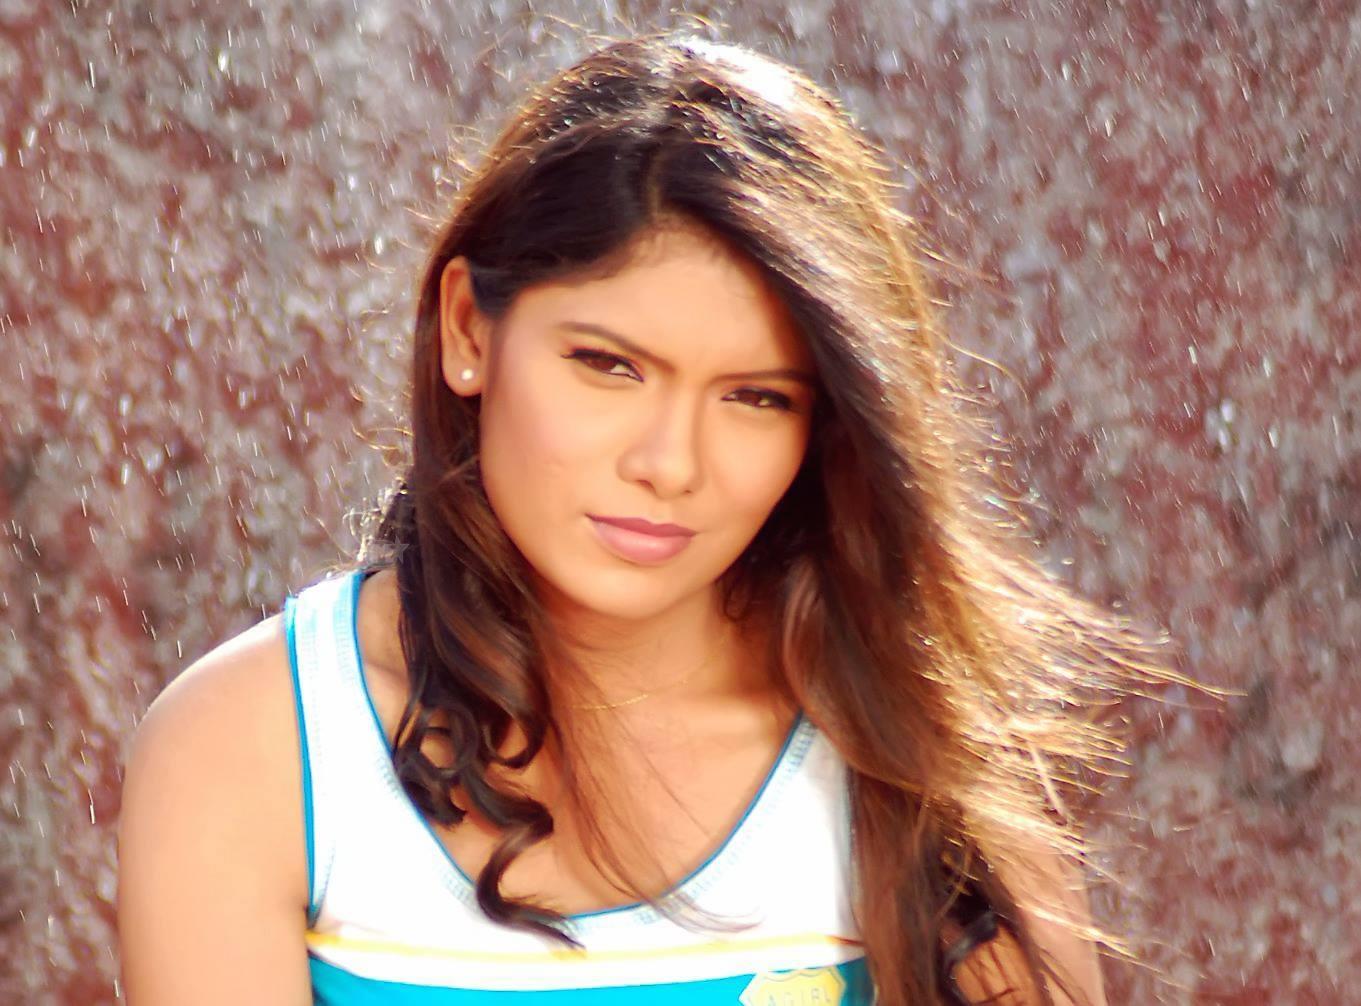 Marathi Actrice Dans Nu - Nouveau Porno-8502